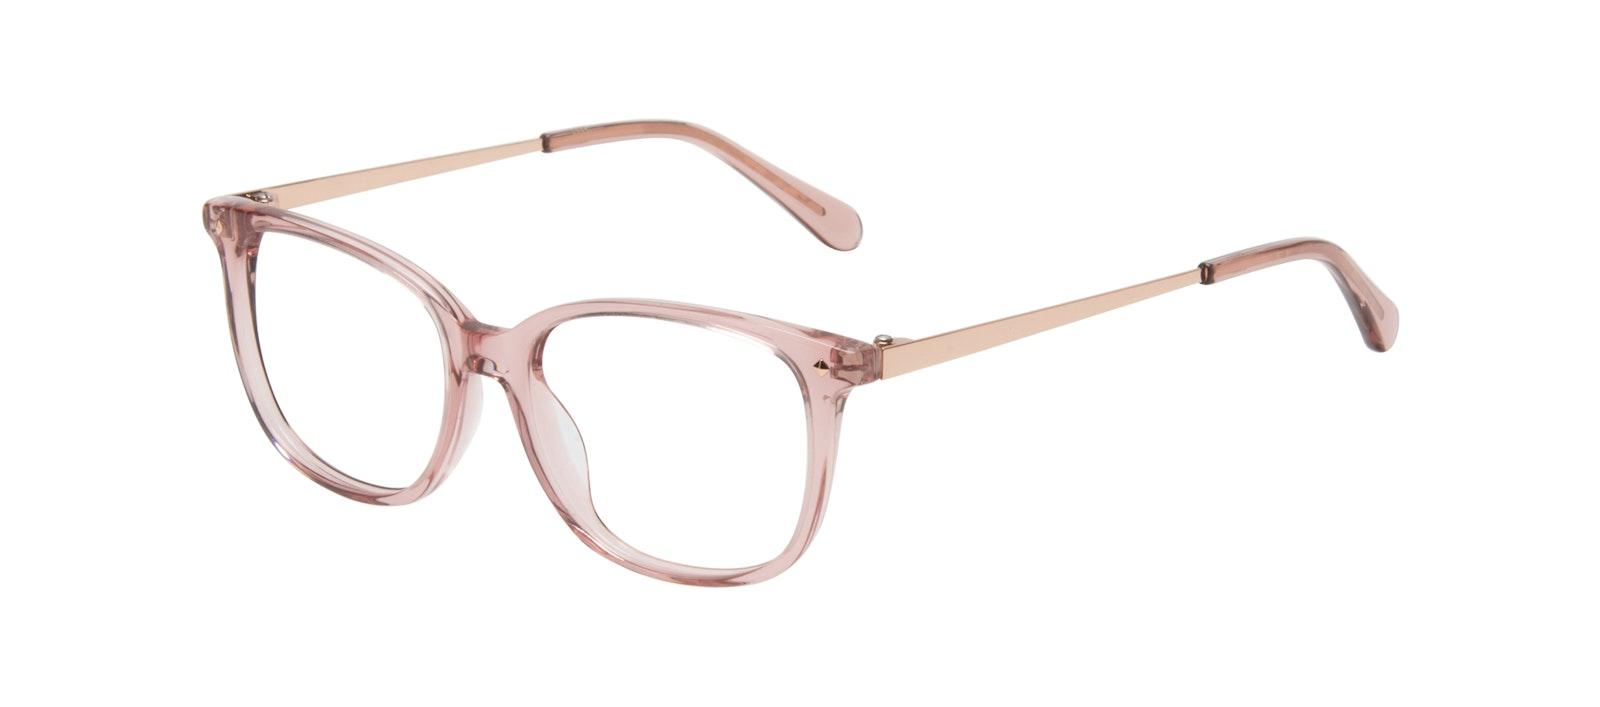 Affordable Fashion Glasses Rectangle Square Eyeglasses Women Refine Rose Tilt